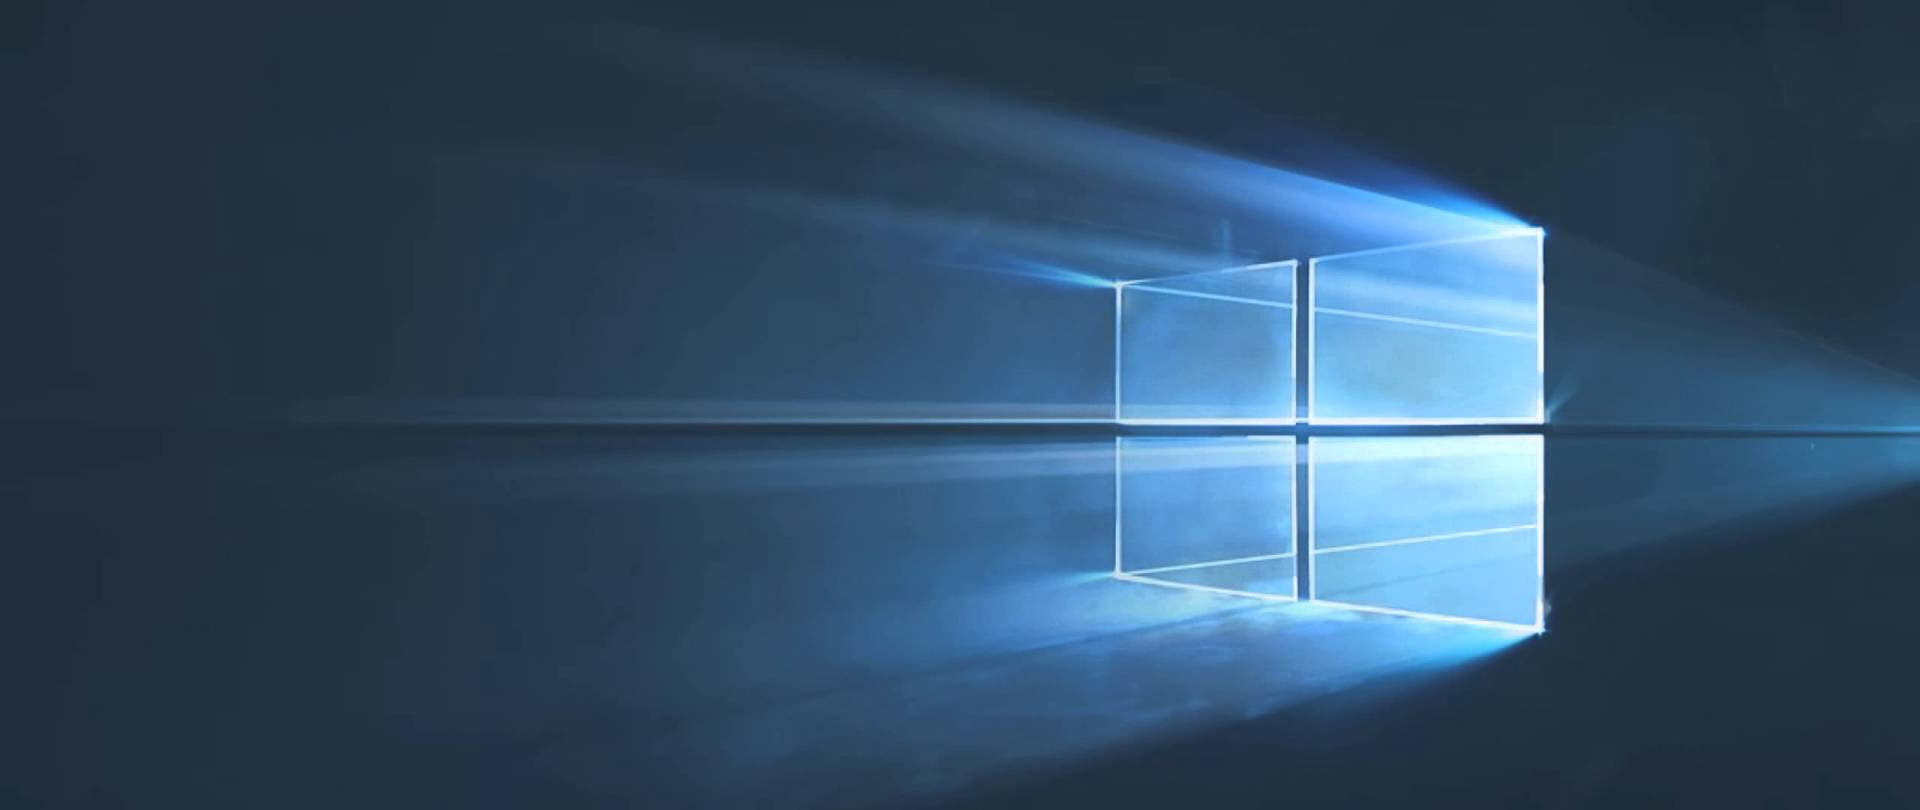 Windows 10 Cycle Wallpapers - WallpaperSafari